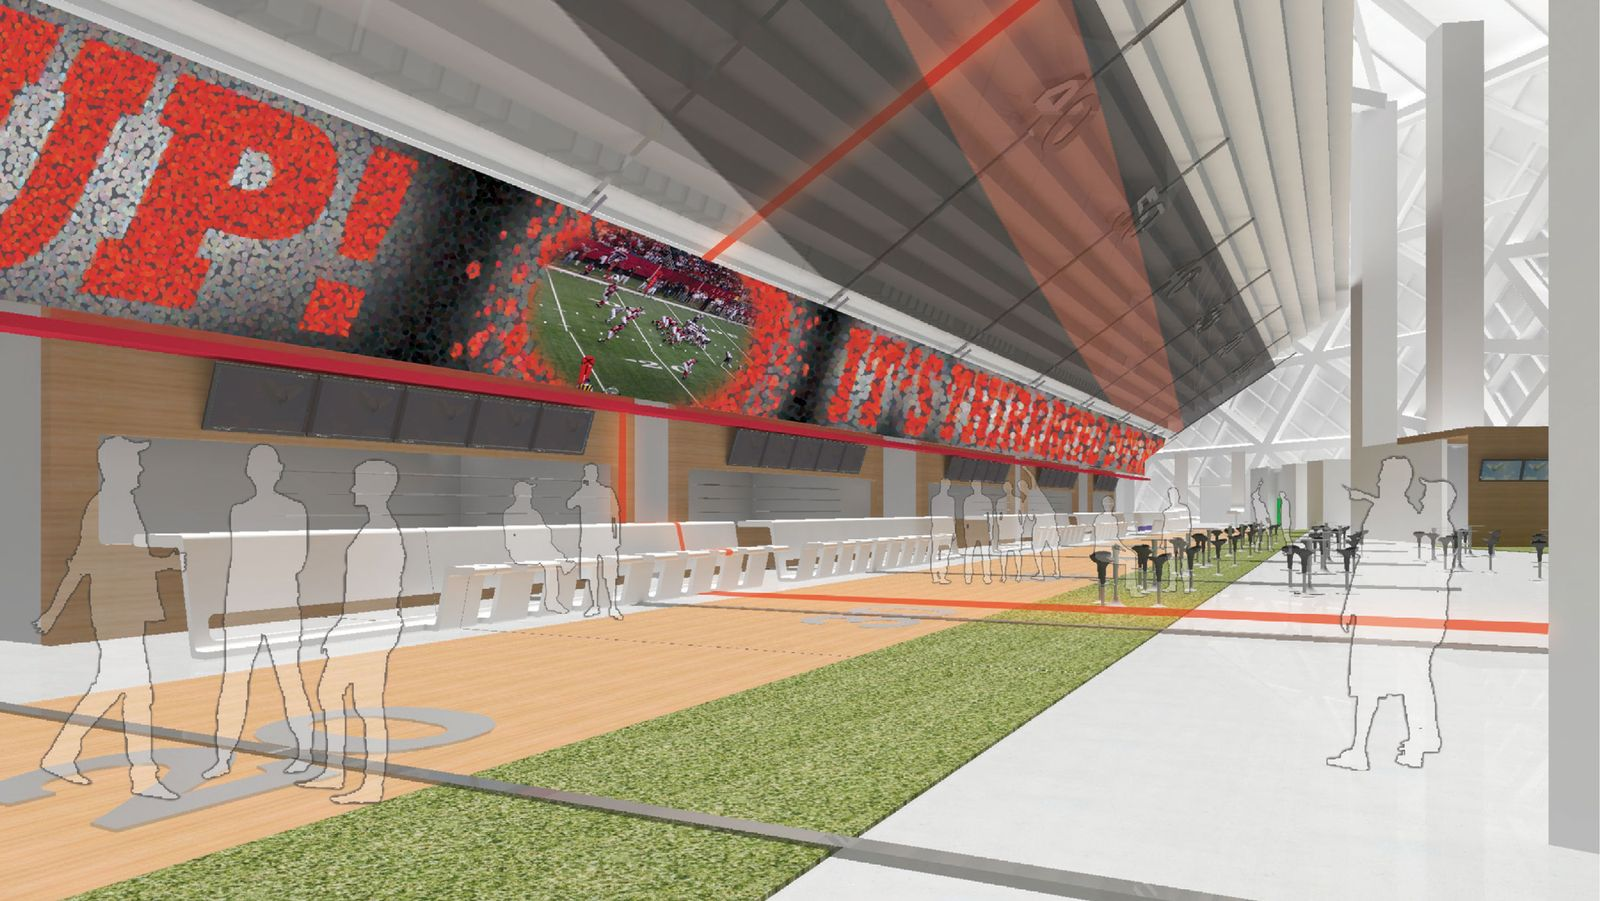 new_falcons_stadium220.jpg